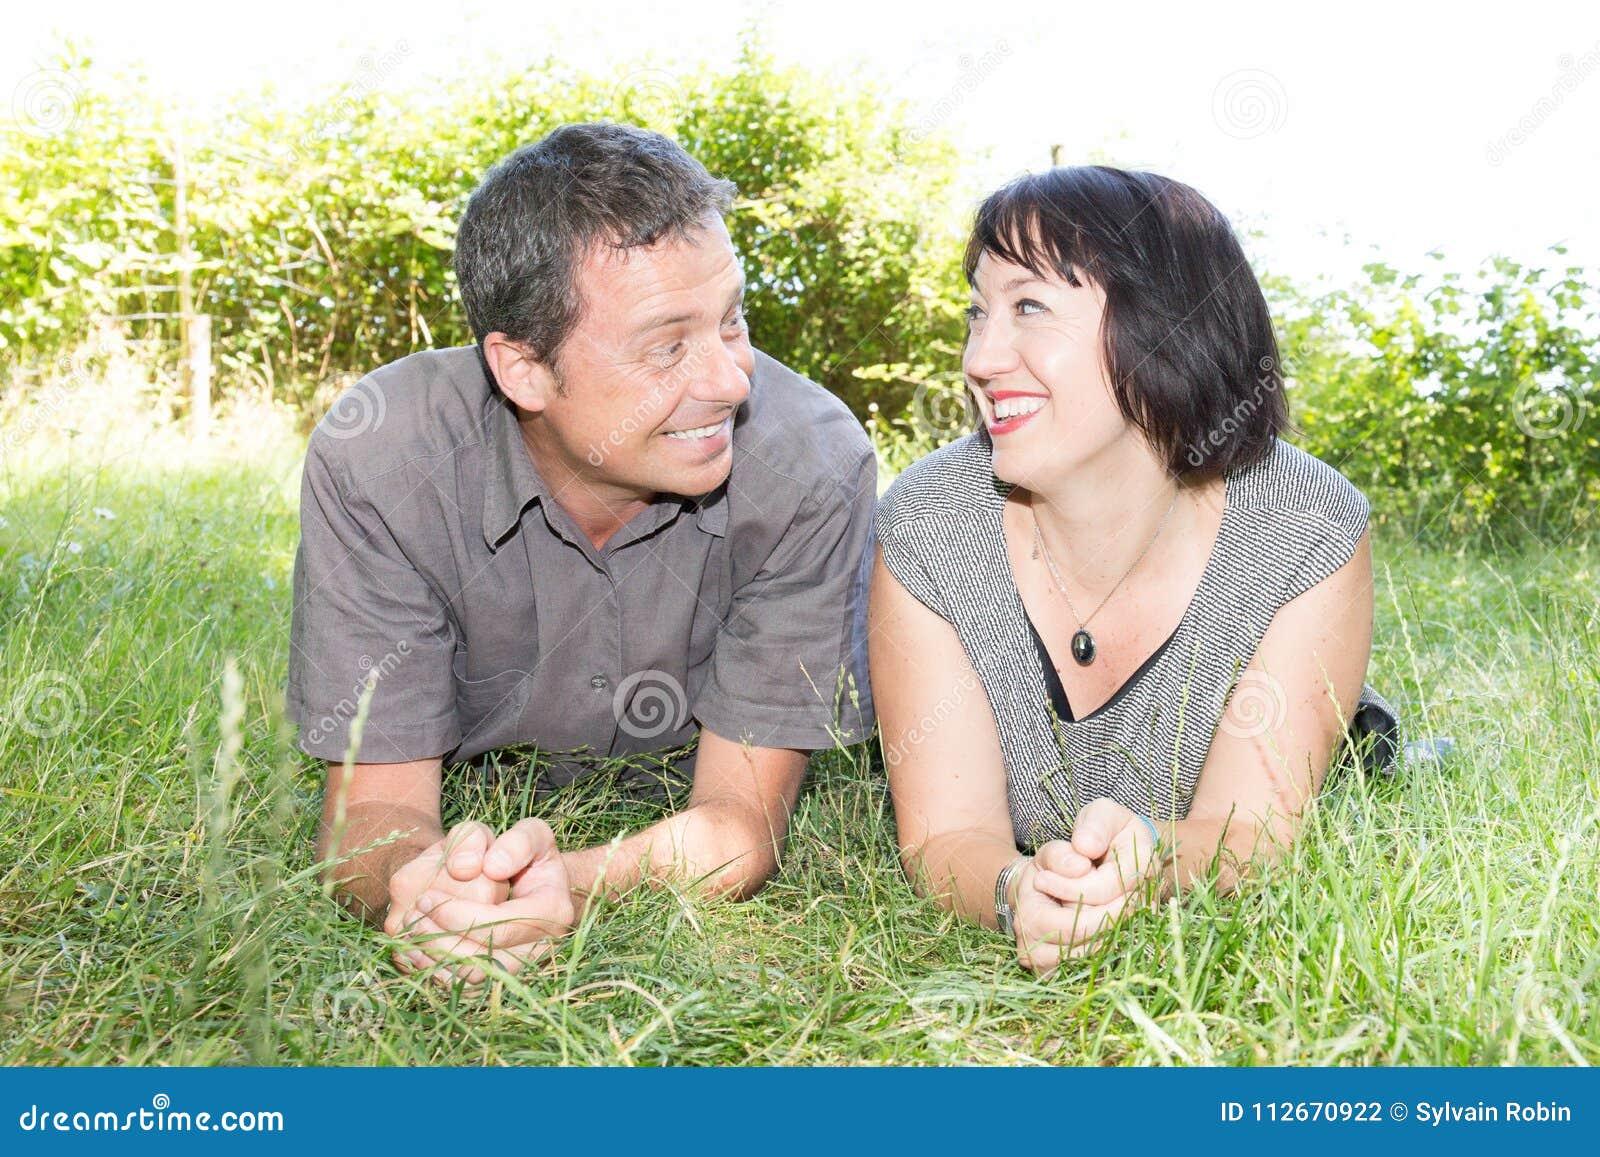 BARBRA: Outdoor mature couple